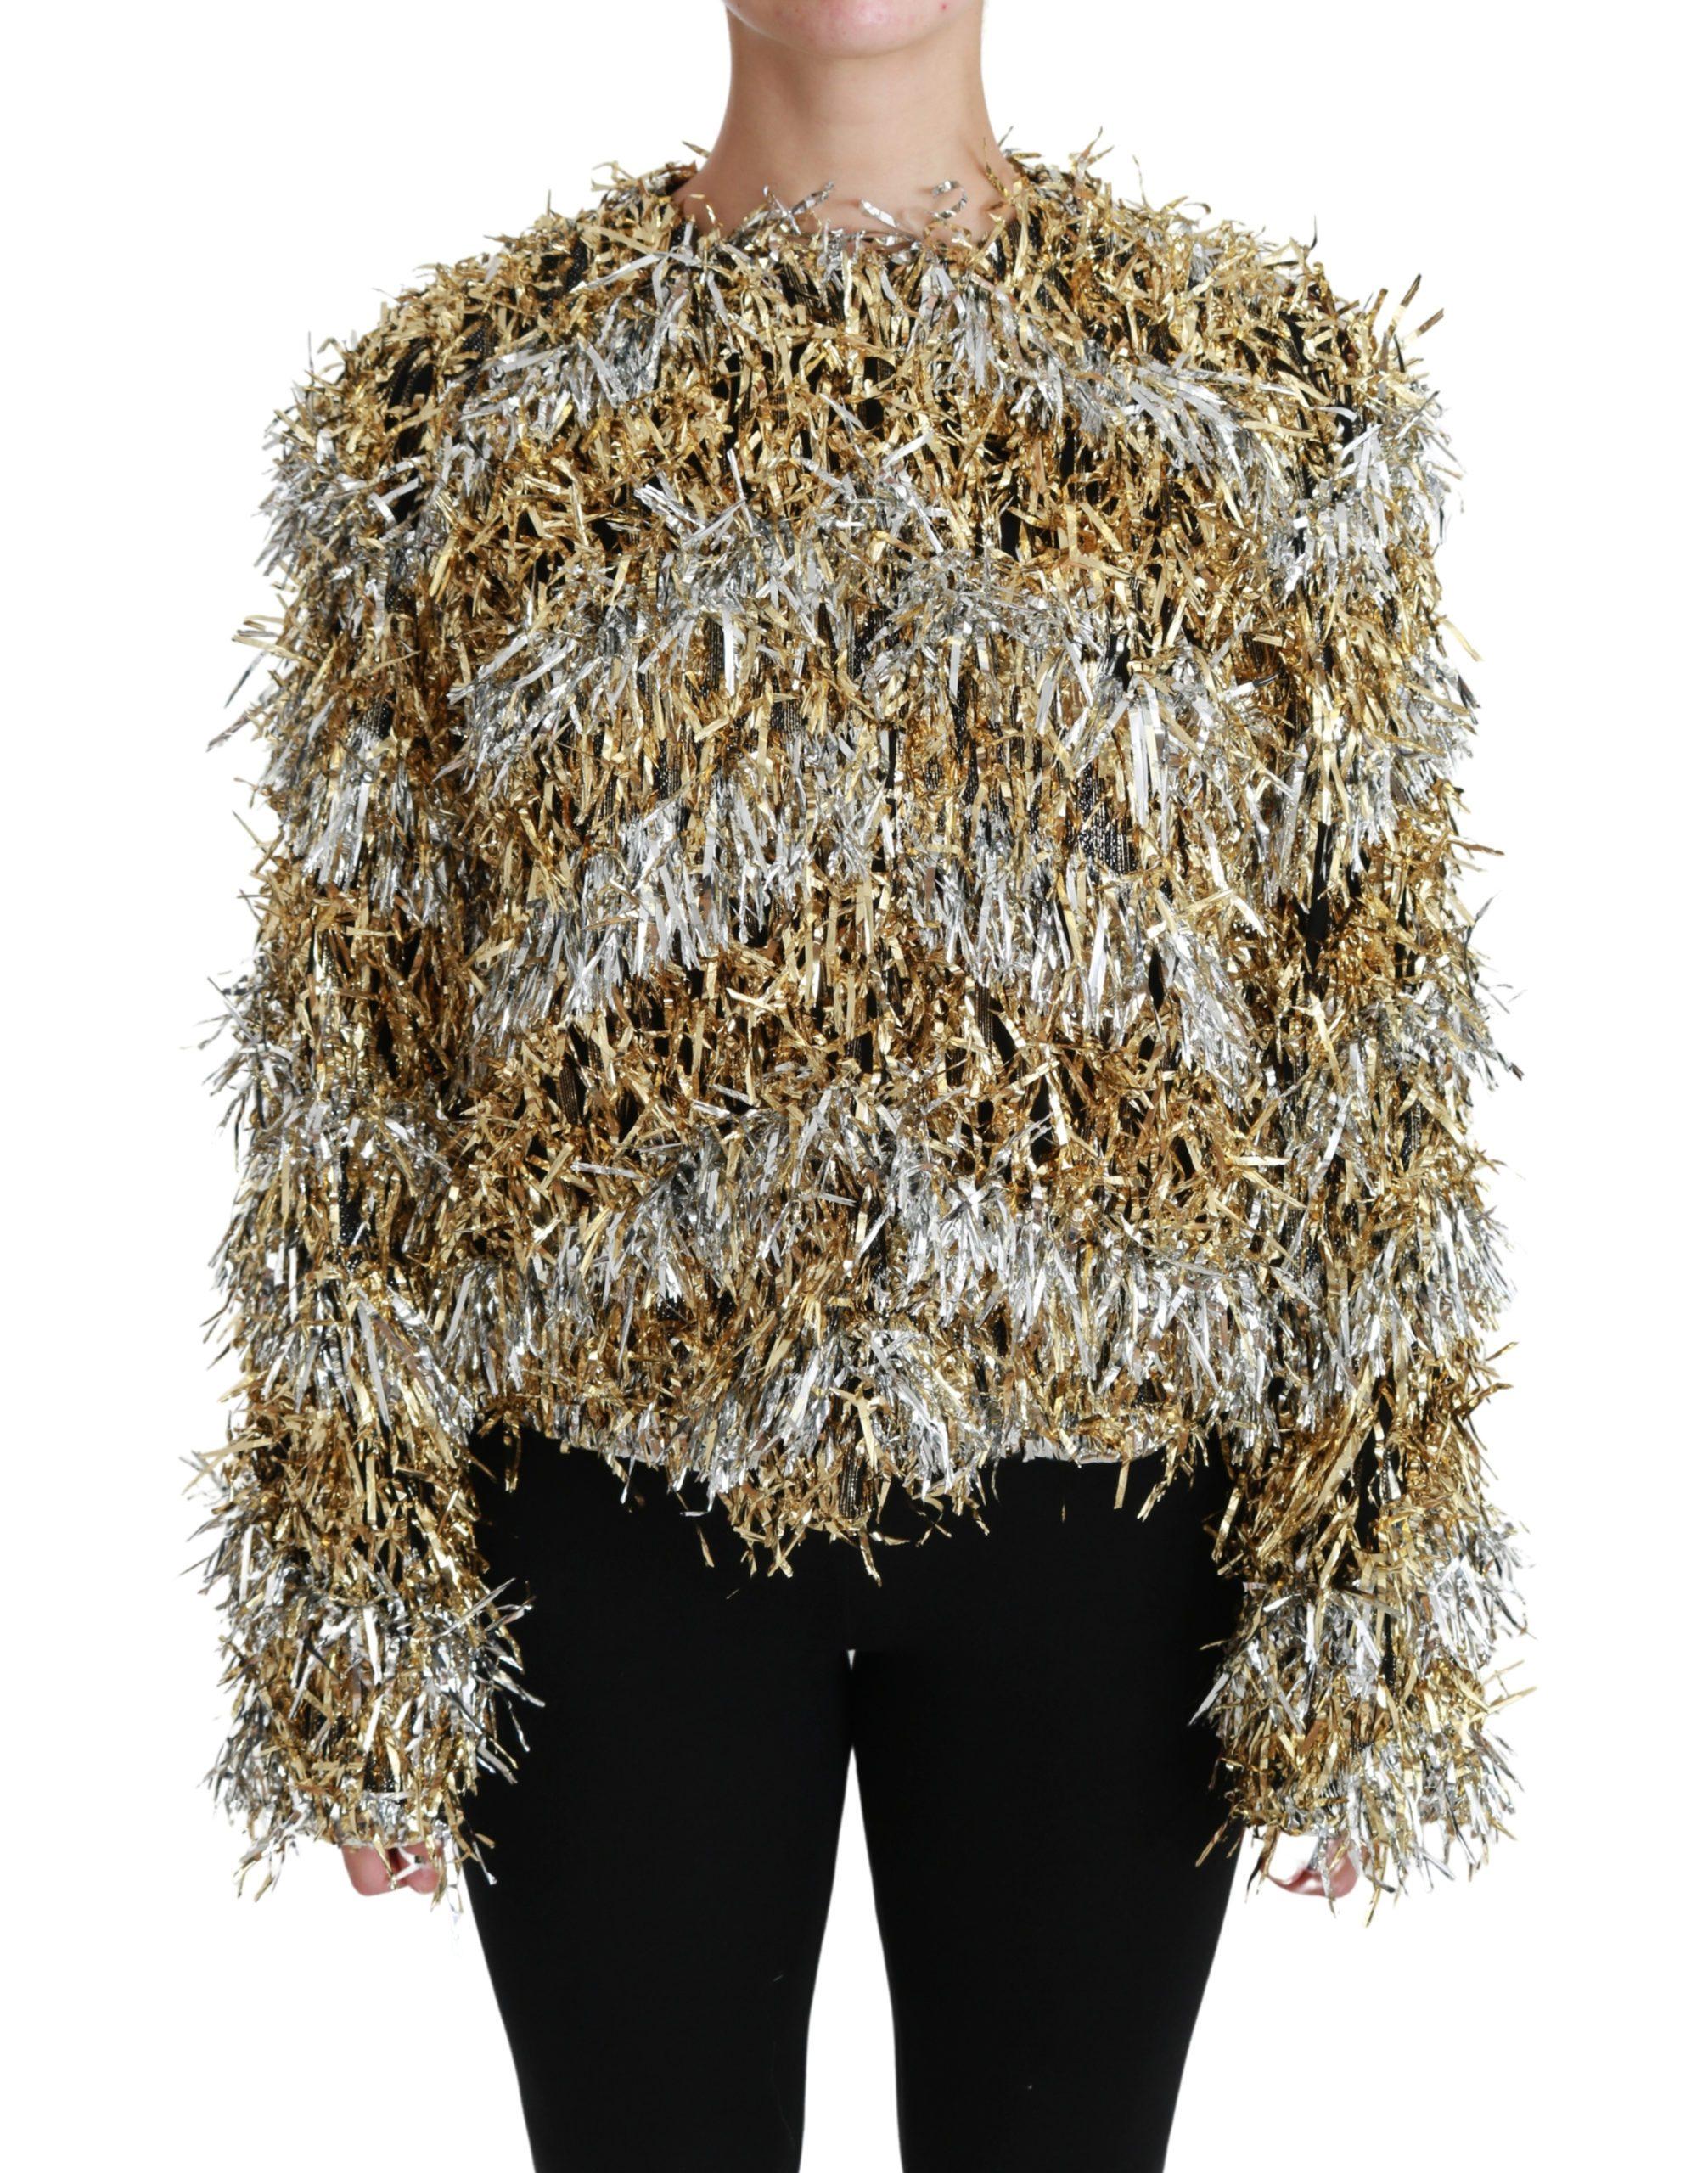 Dolce & Gabbana Women's Cardigan Jacket Gold JKT2583 - IT40 S